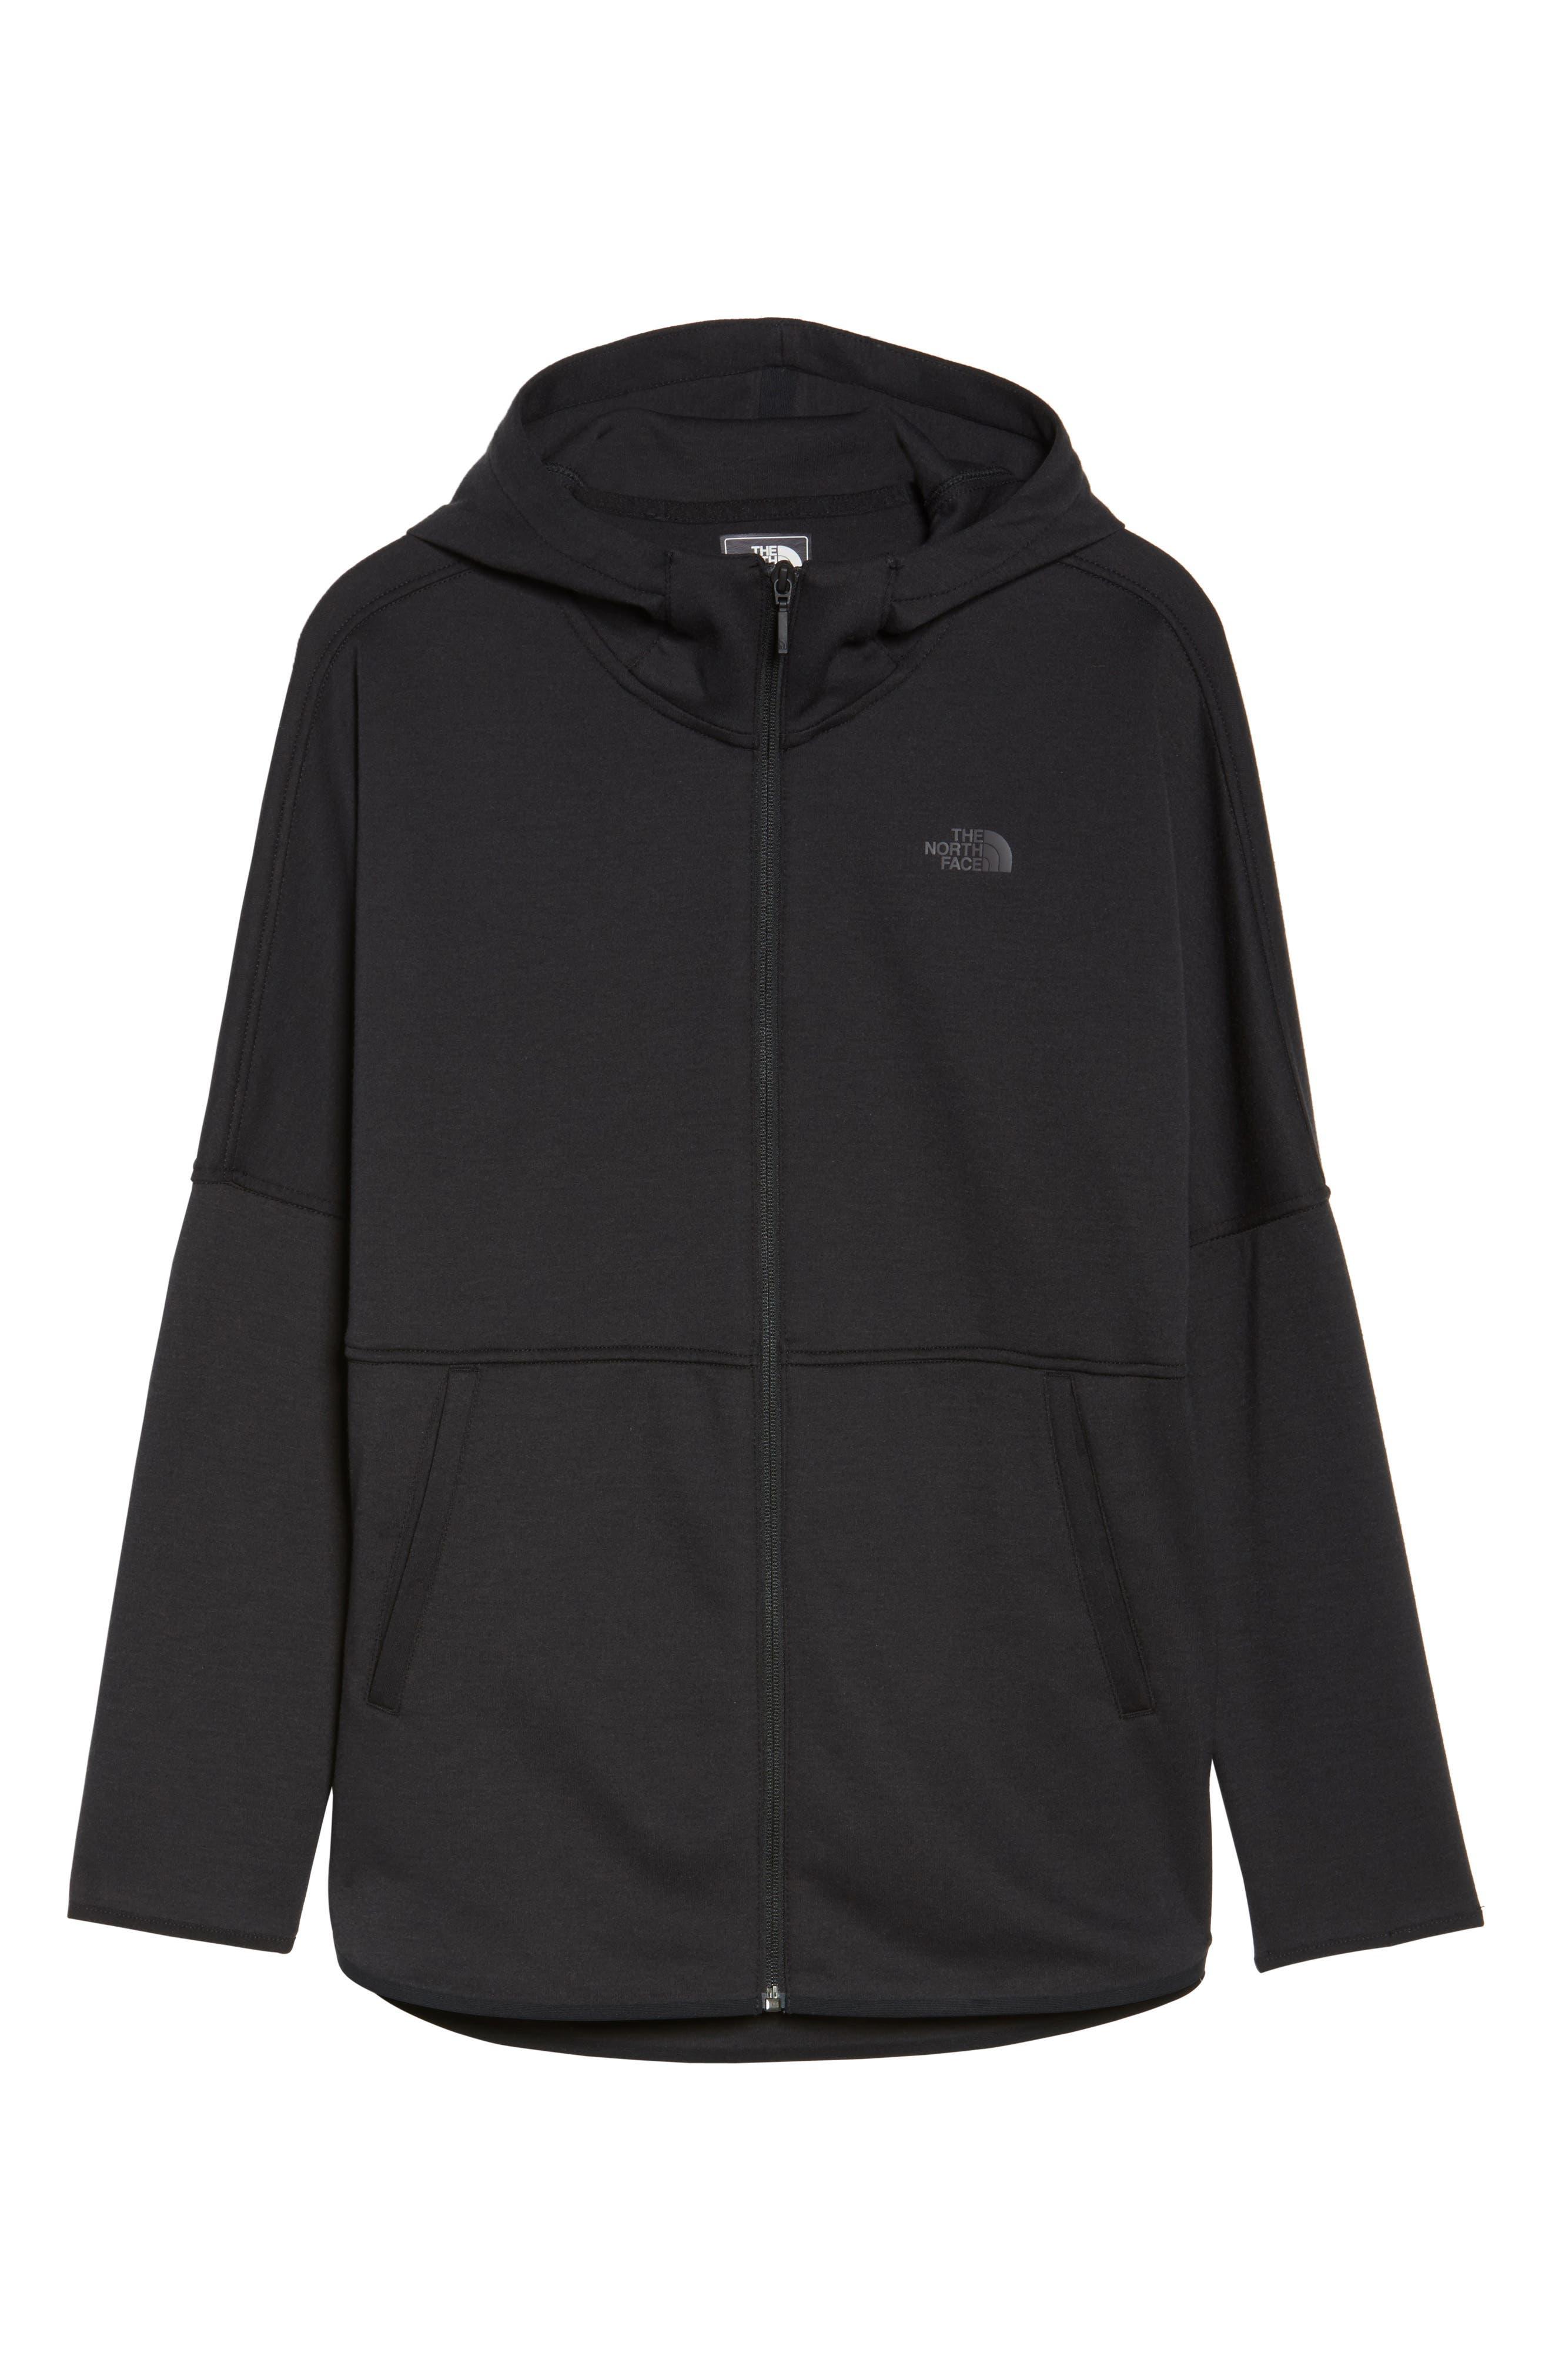 Slacker Hooded Jacket,                             Alternate thumbnail 7, color,                             Tnf Black